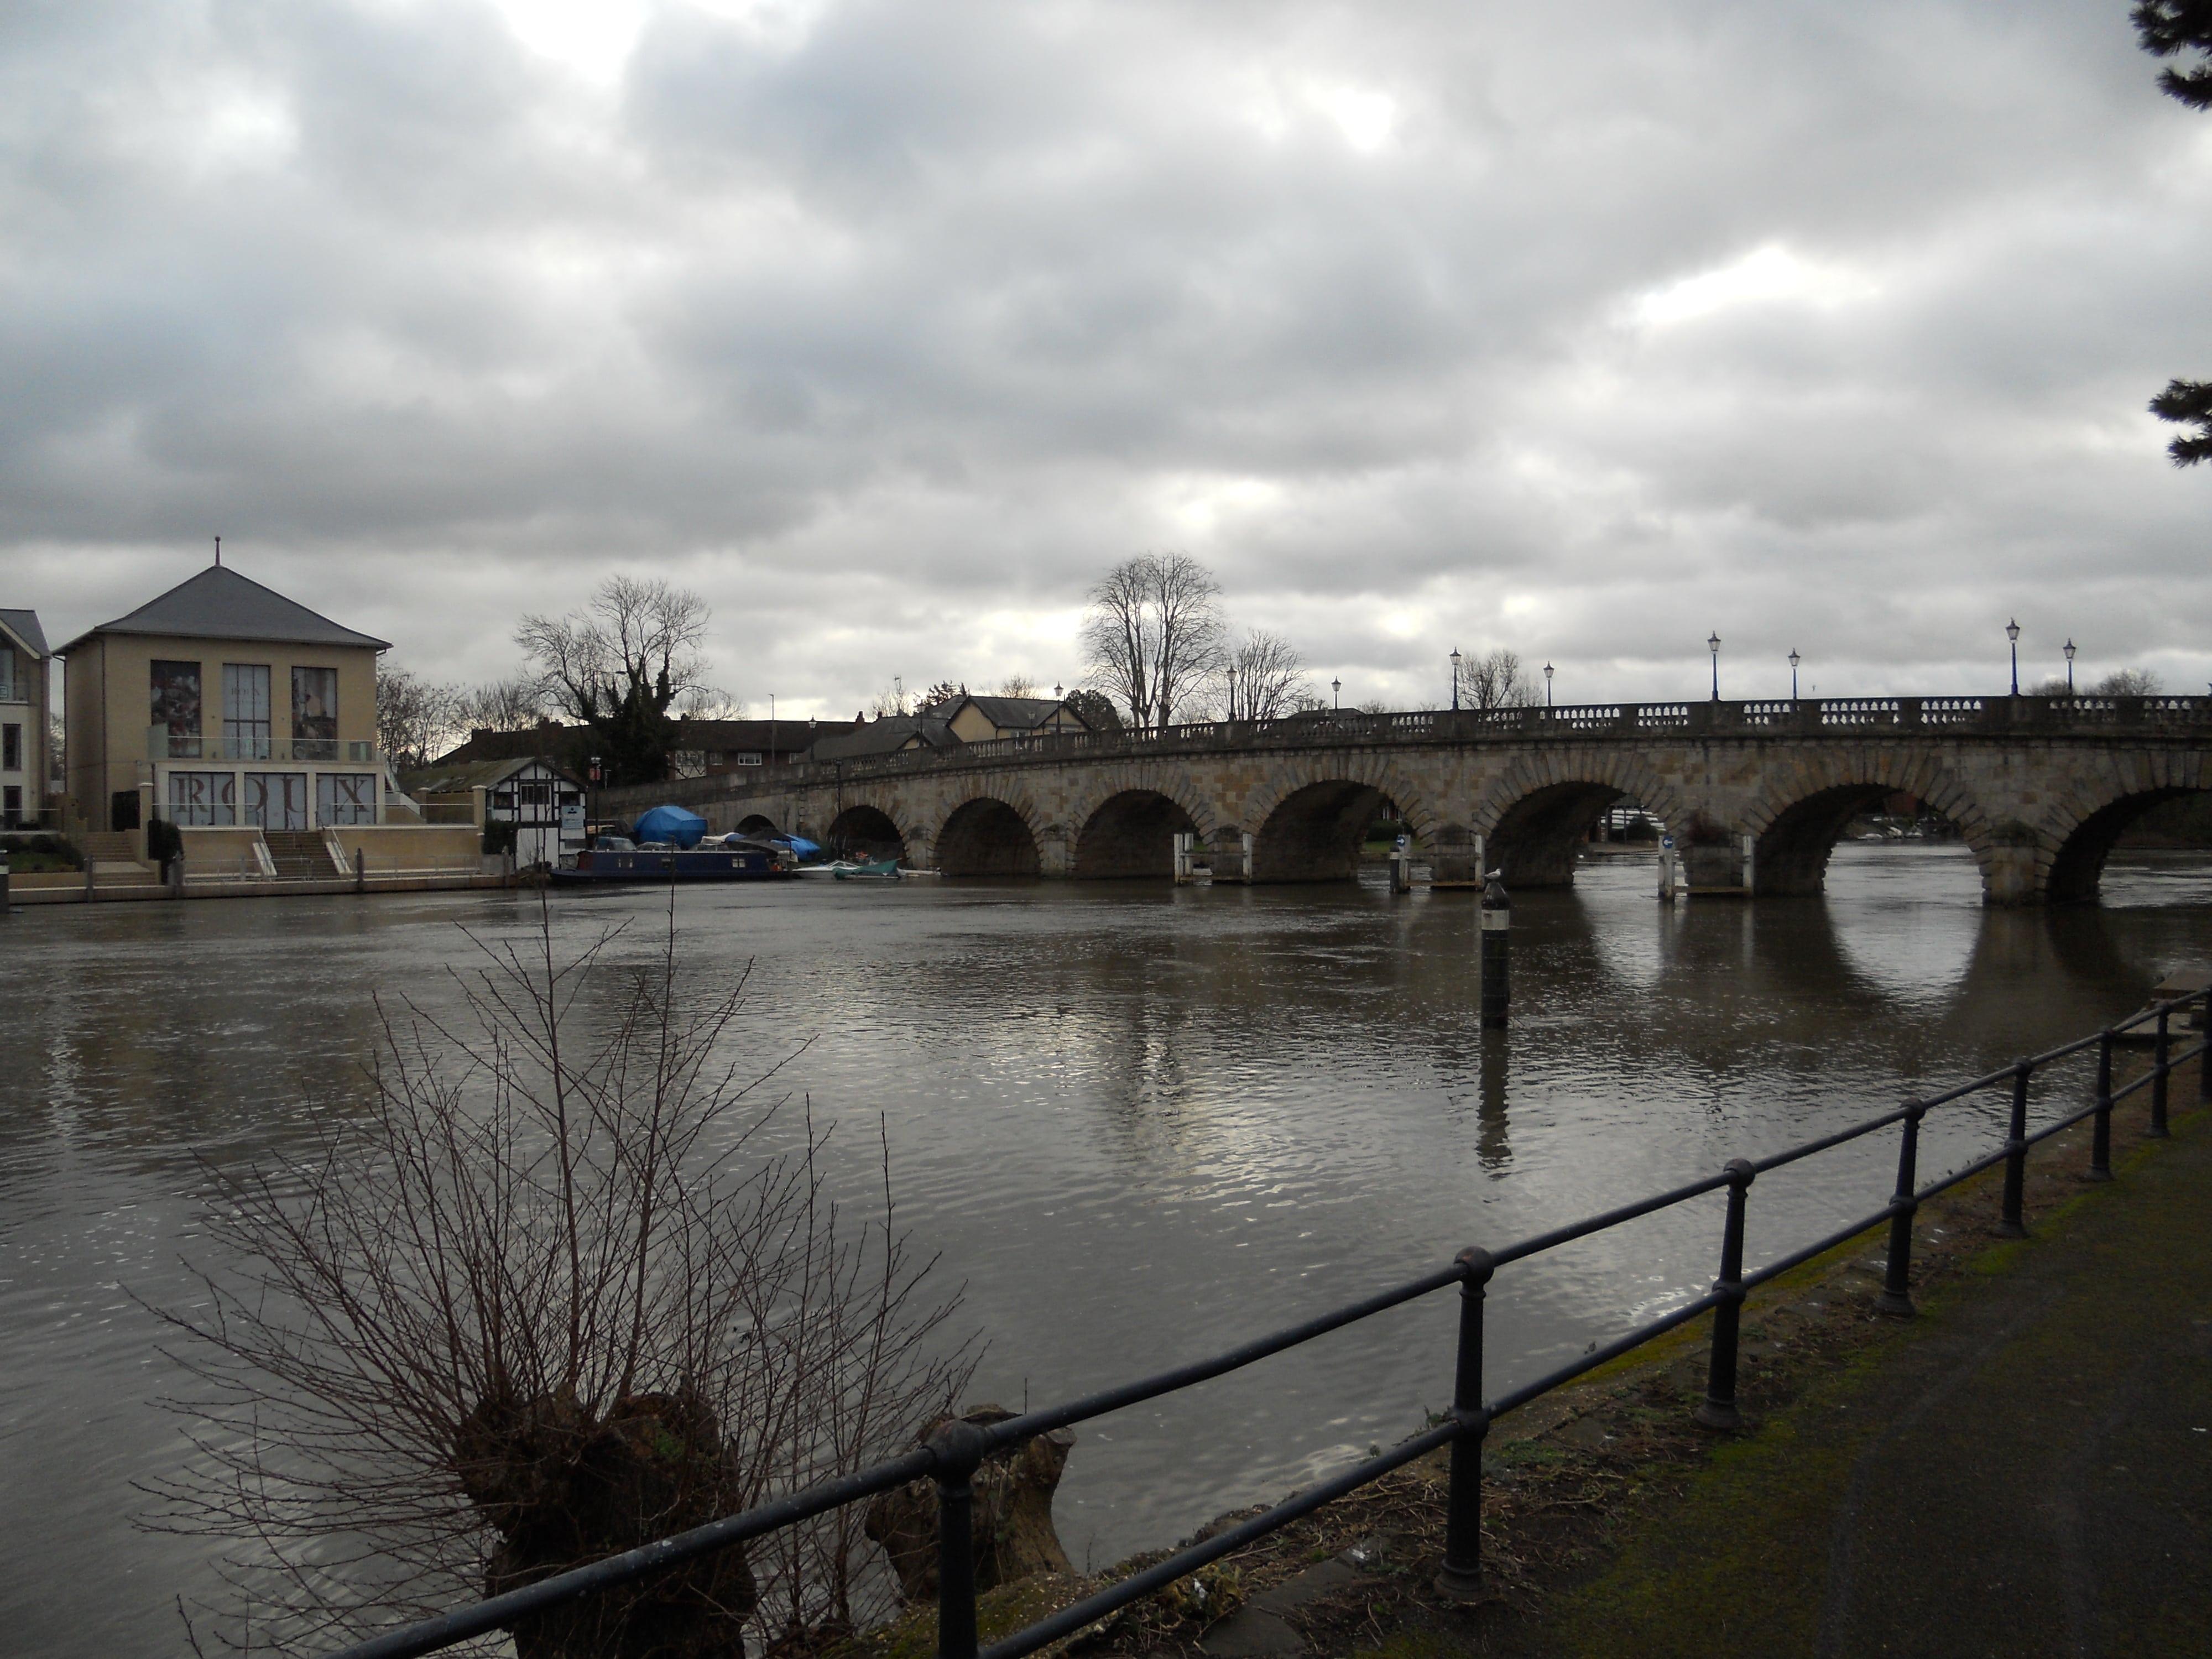 Maidenhead Bridge from the riverside